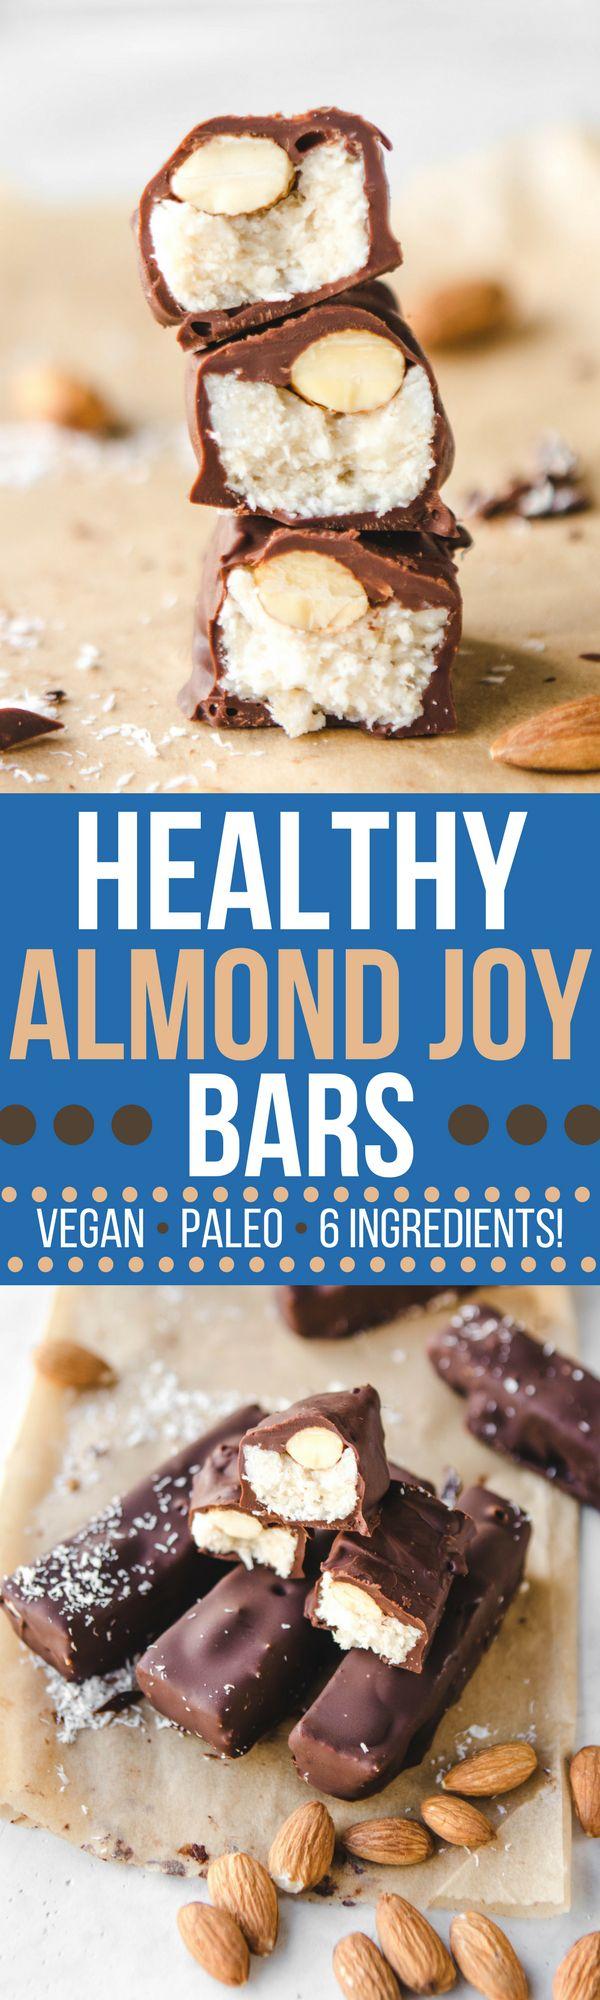 pinterest image of almond joy bars